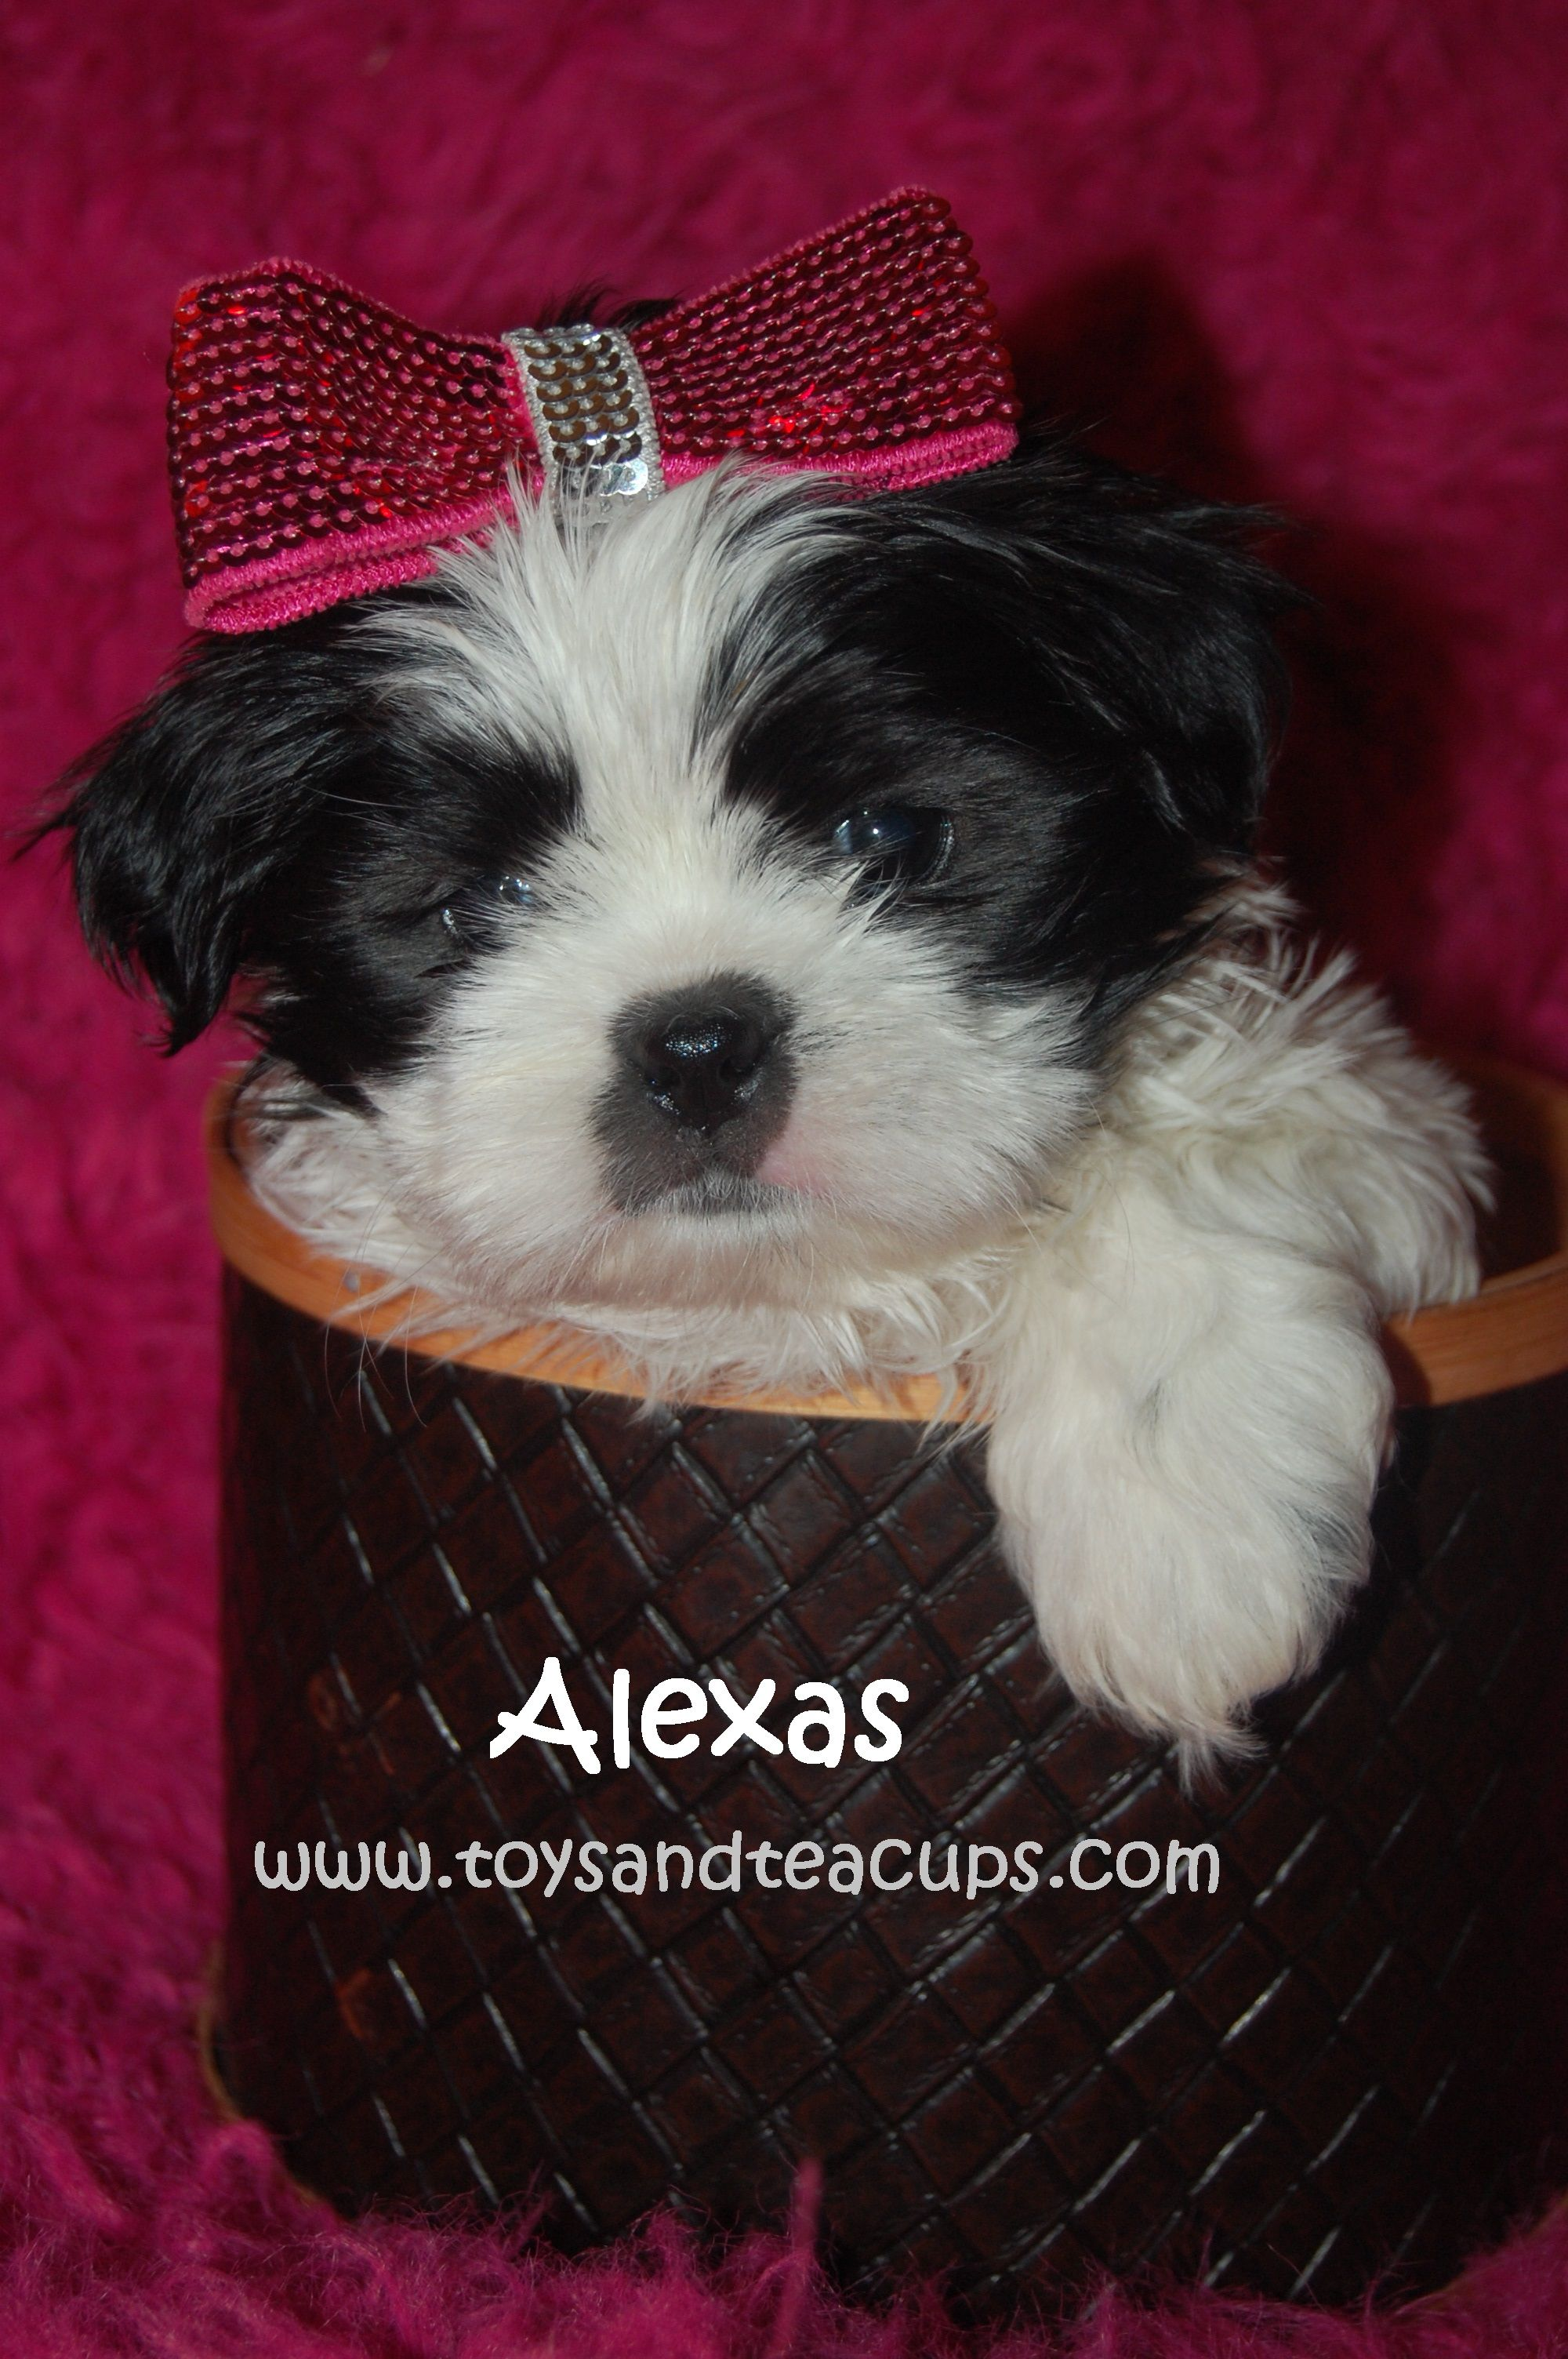 Shih Tzu Puppies For Sale Www Toysandteacups Com 256 200 0512 Shih Tzu Puppy I Love Dogs Cute Animals